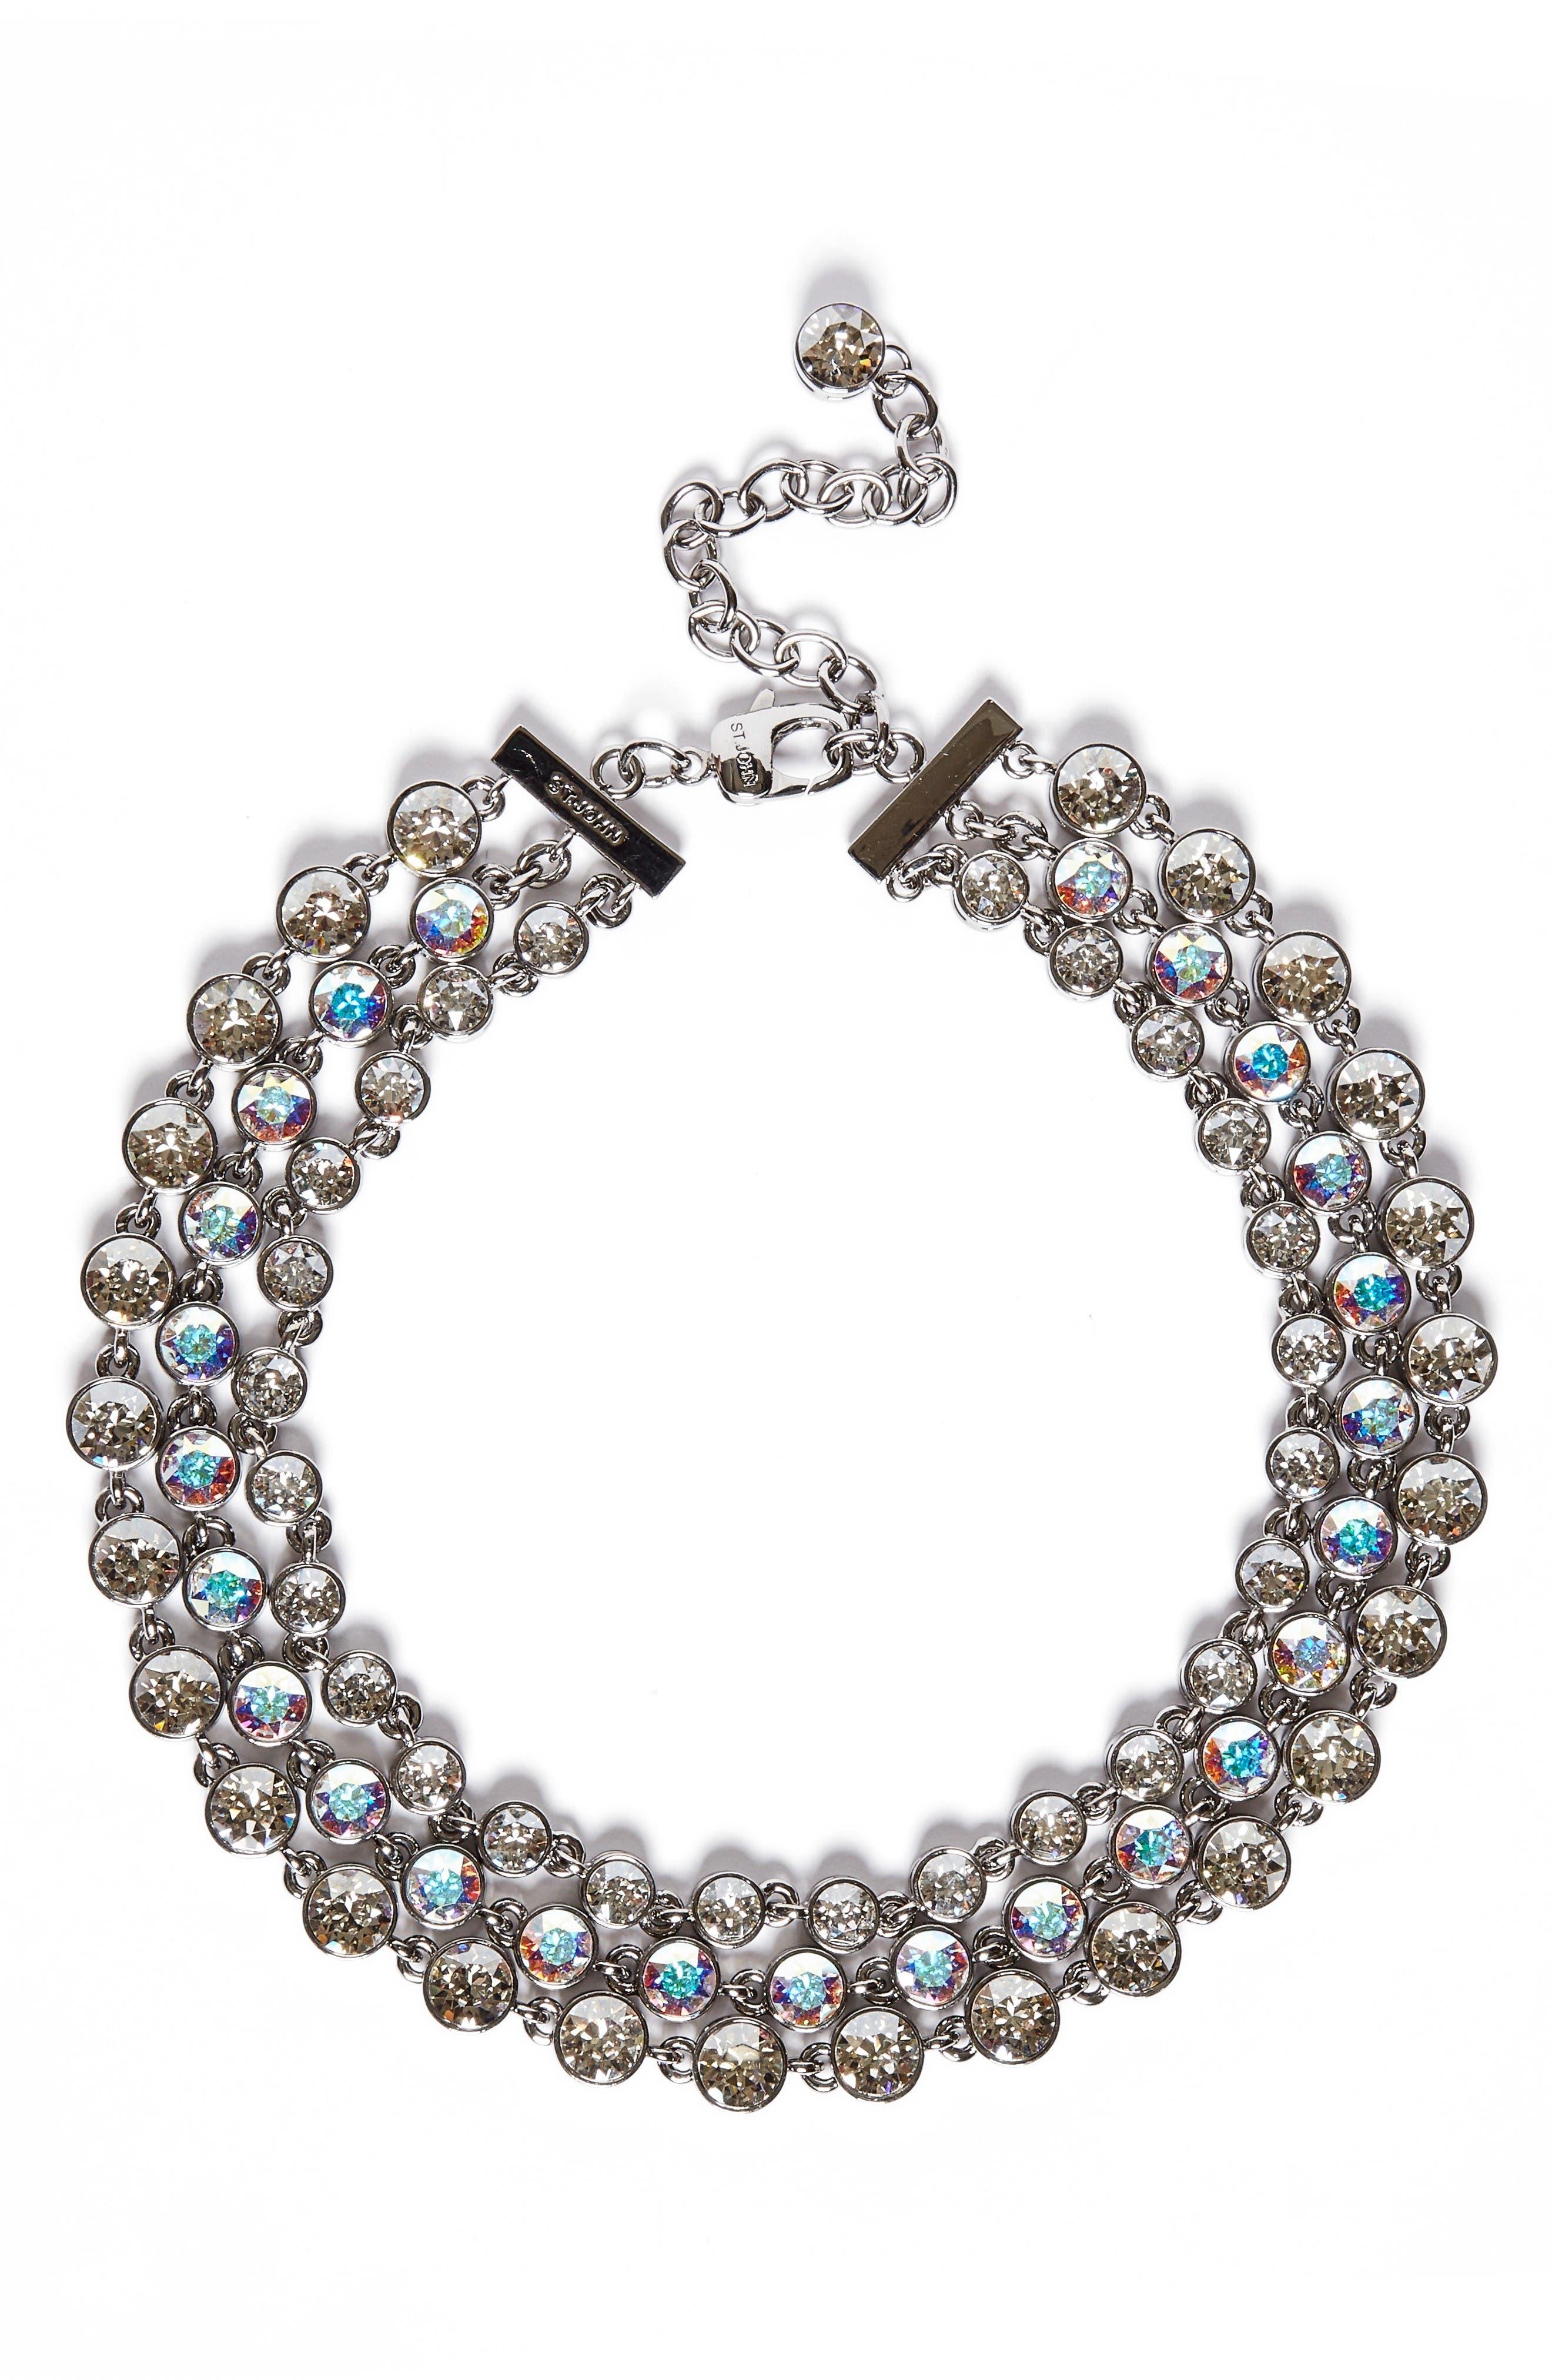 Alternate Image 1 Selected - St. John Collection Swarovski Crystal Collar Necklace